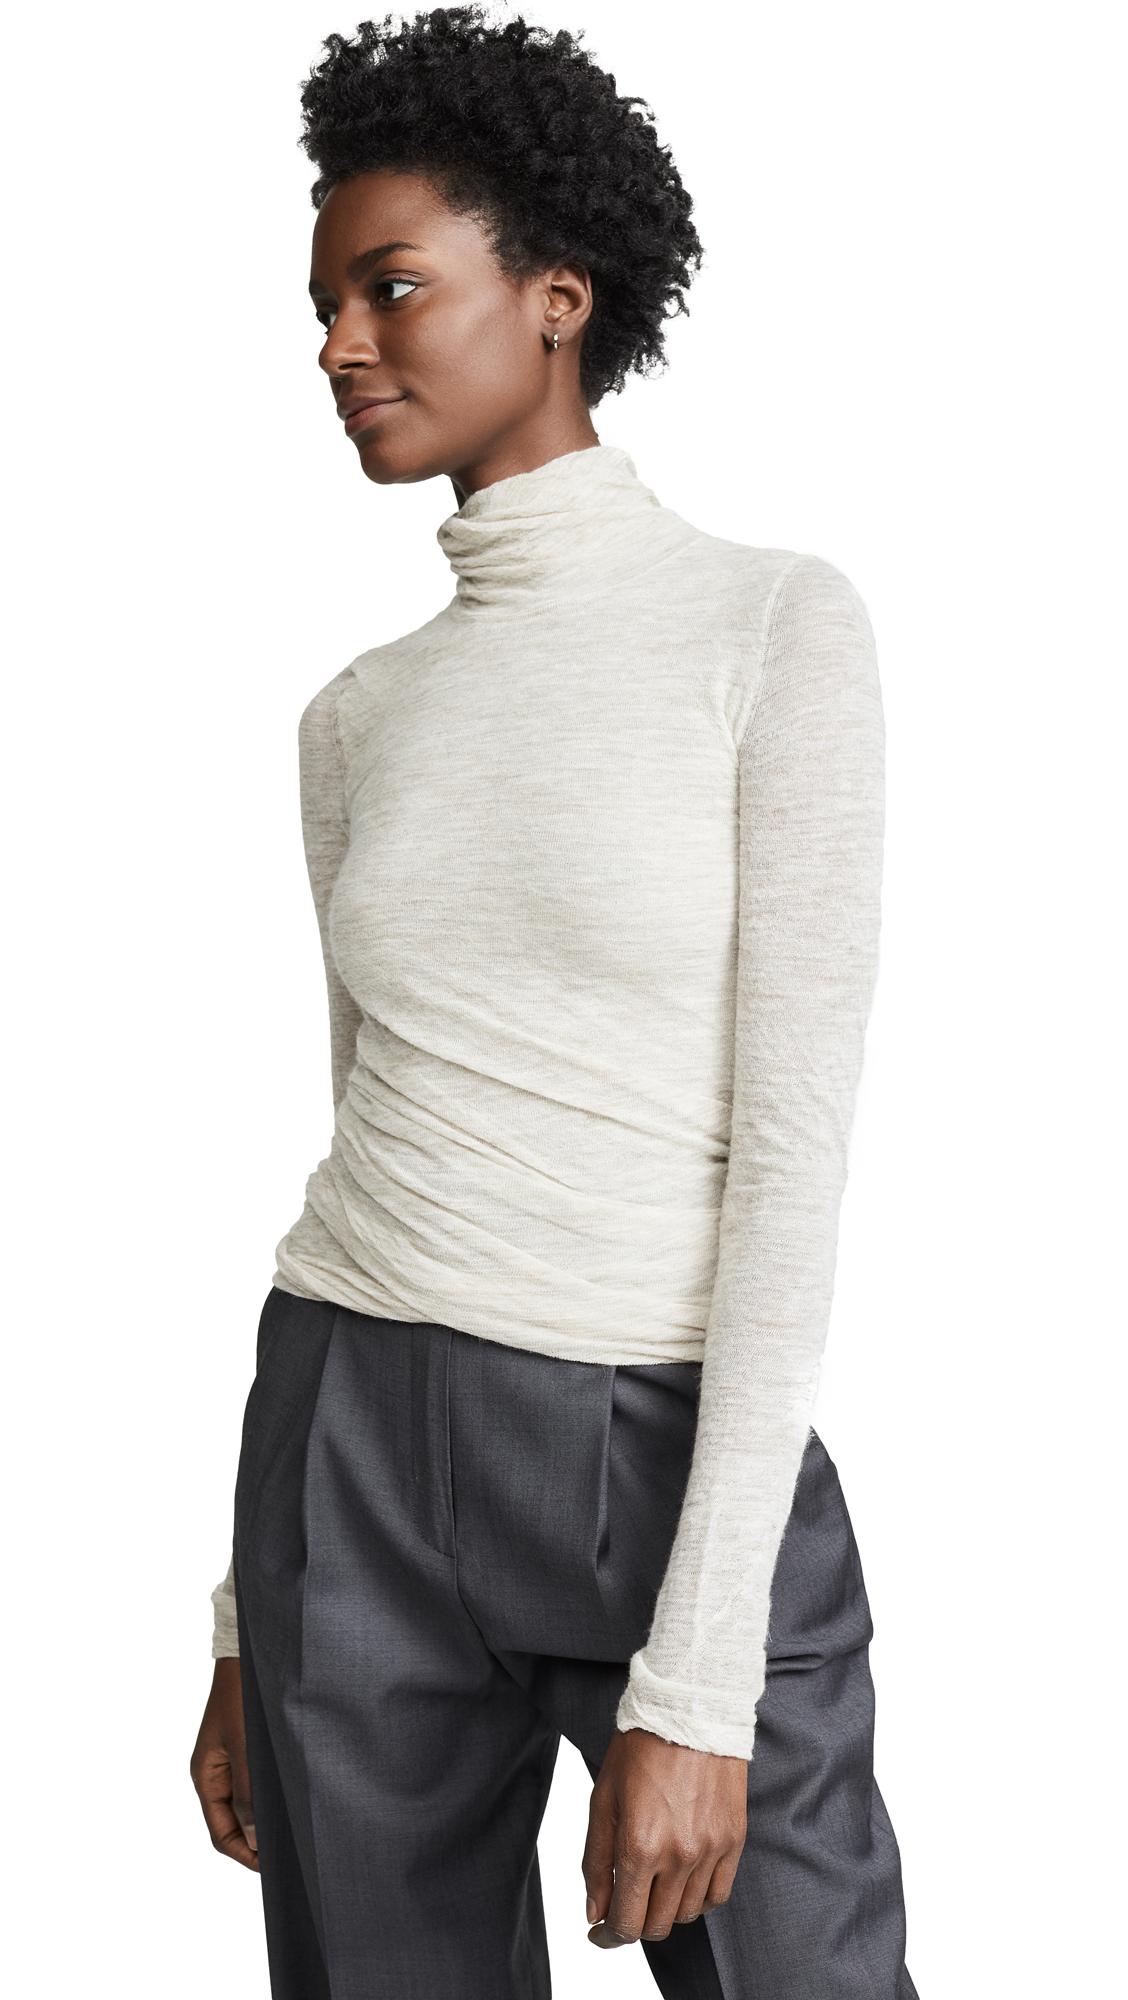 Theory Twist Turtleneck Sweater - Light Melange Brown